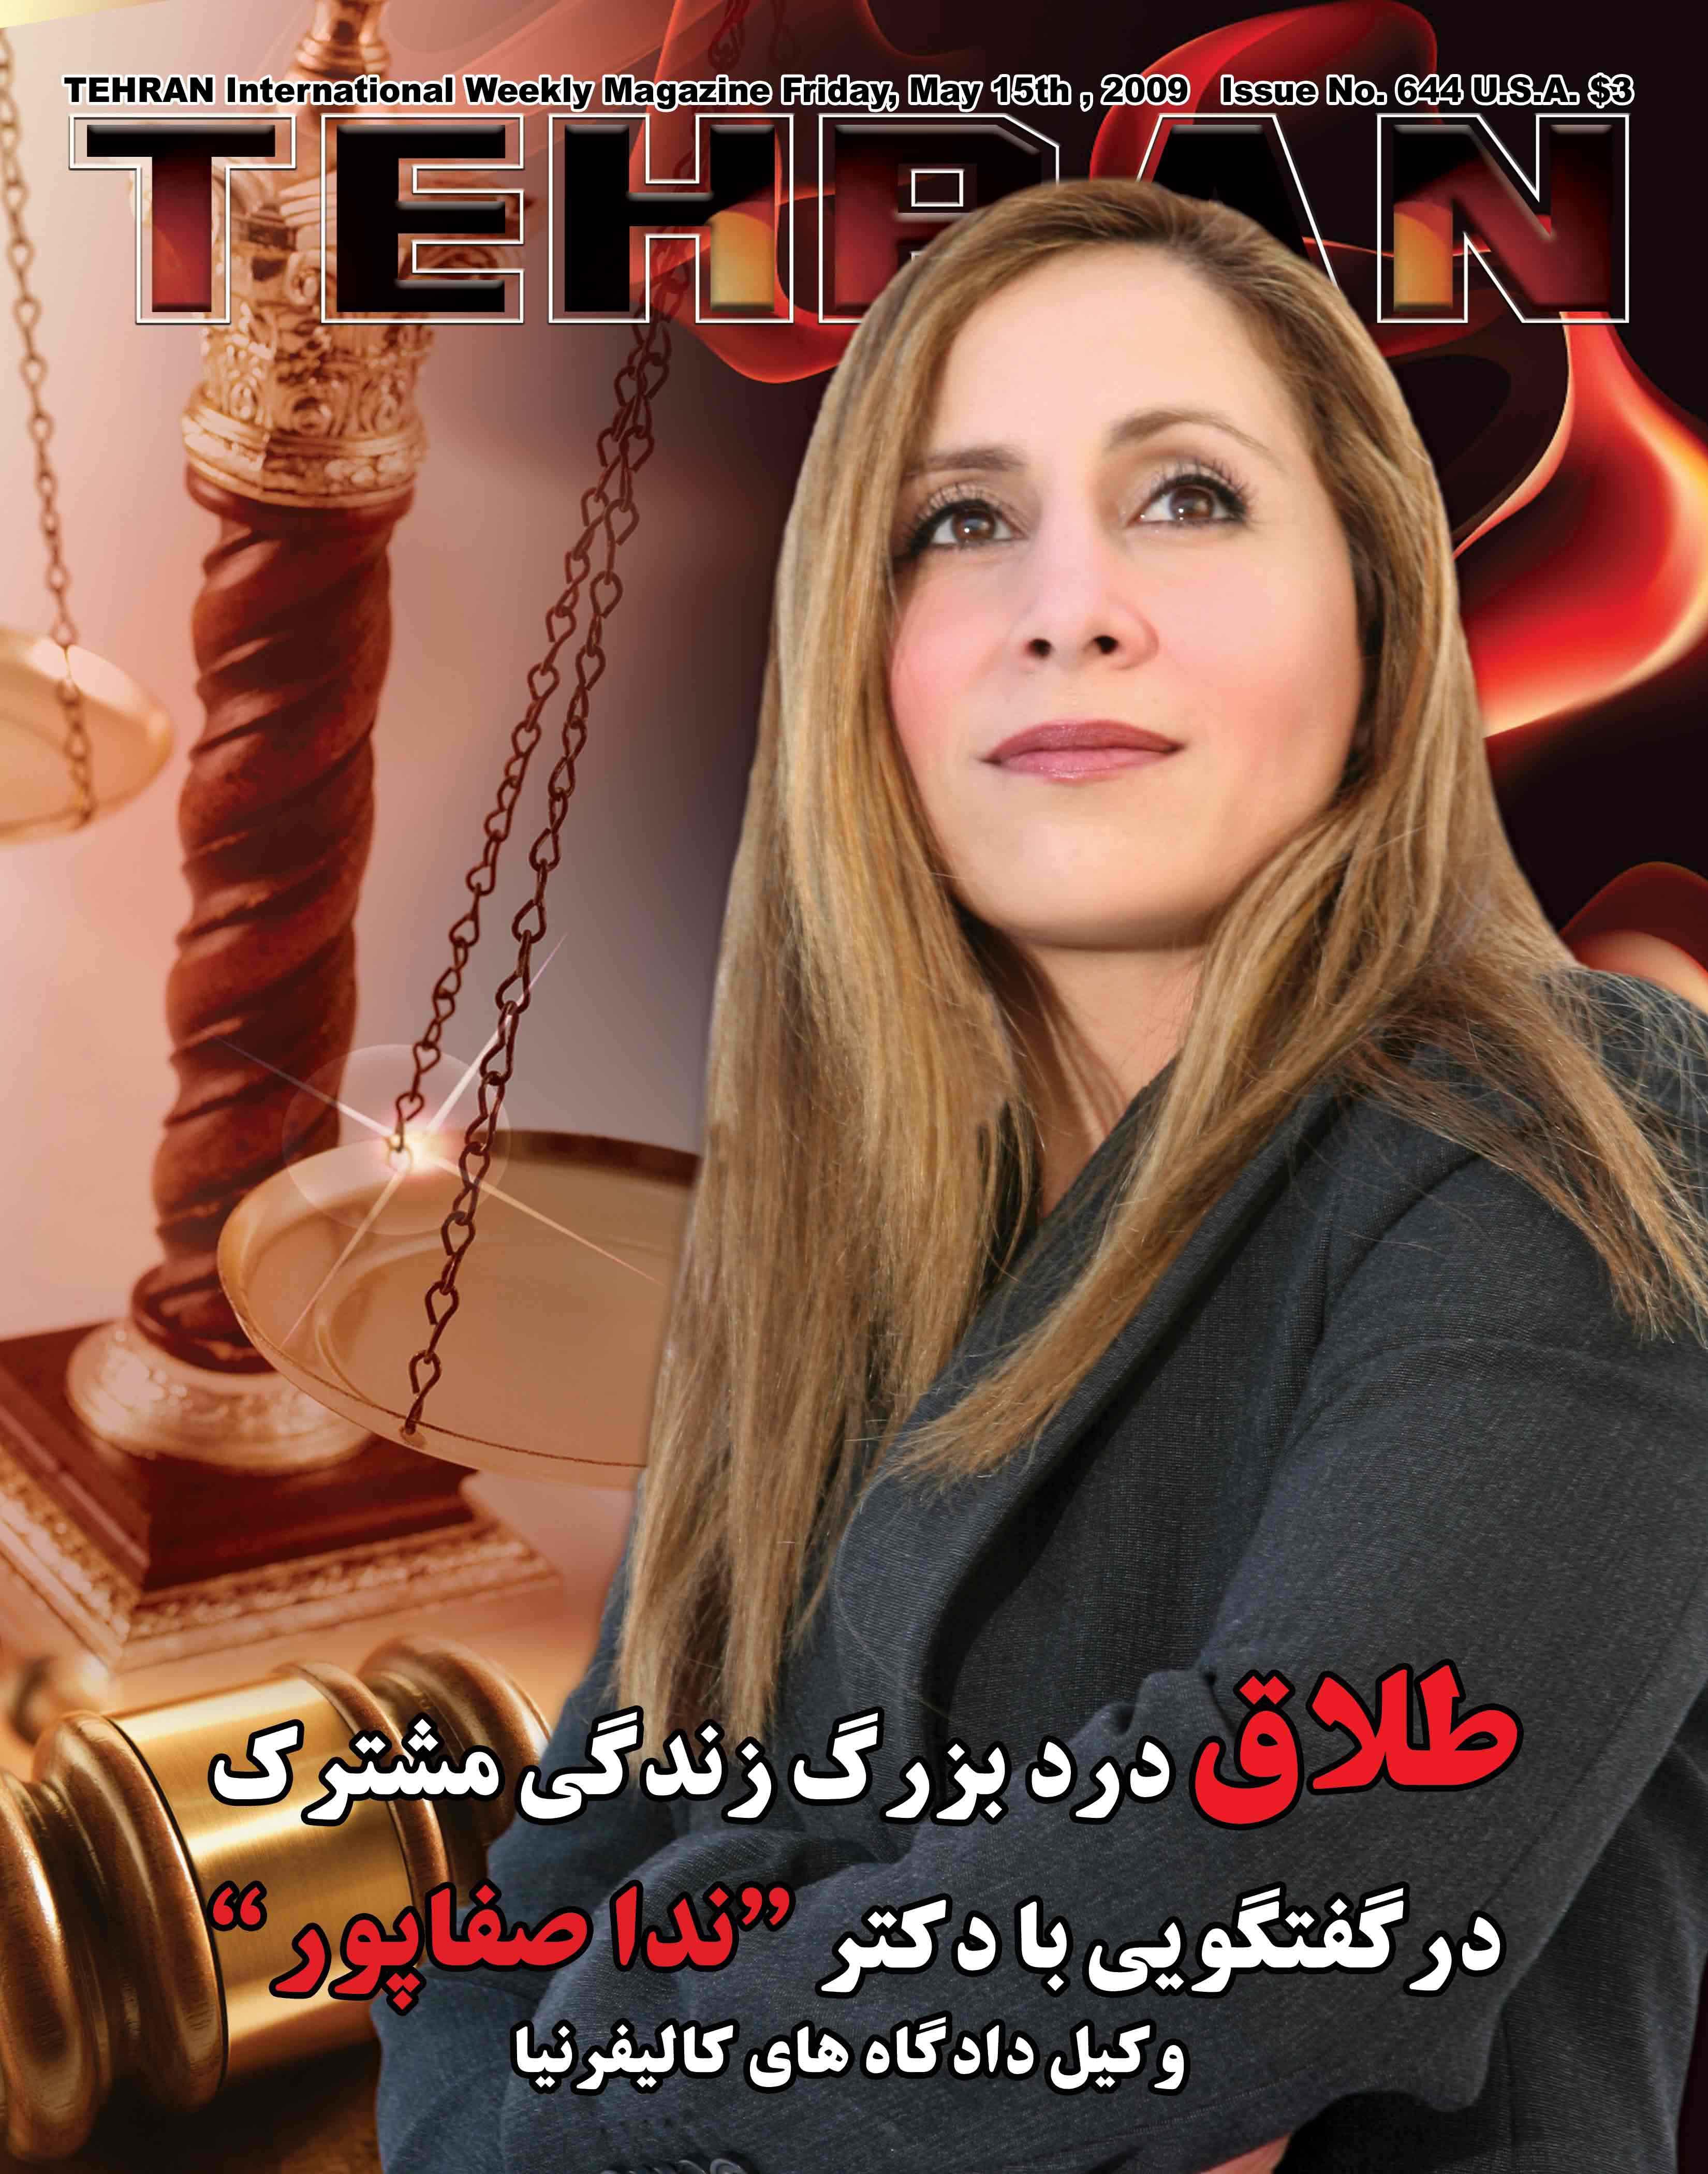 644 Neda Safapour